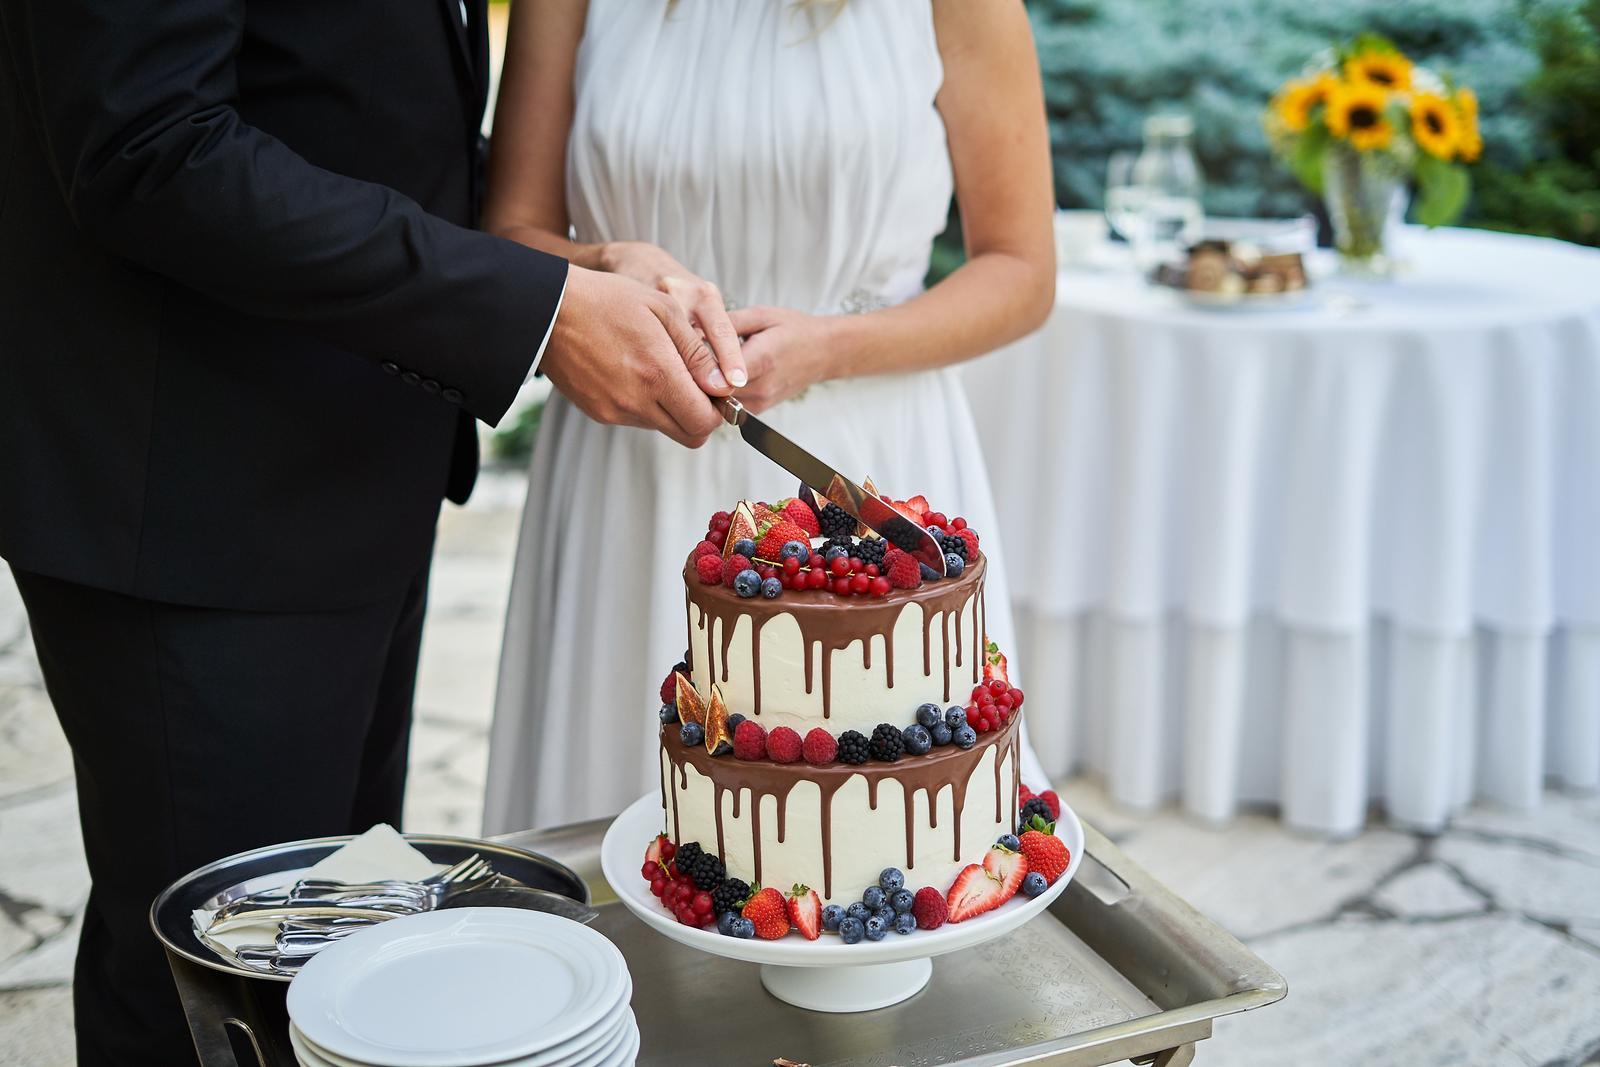 Svadobné torty - Foto: http://flashphoto.sk/. Realizácia: www.castel.sk